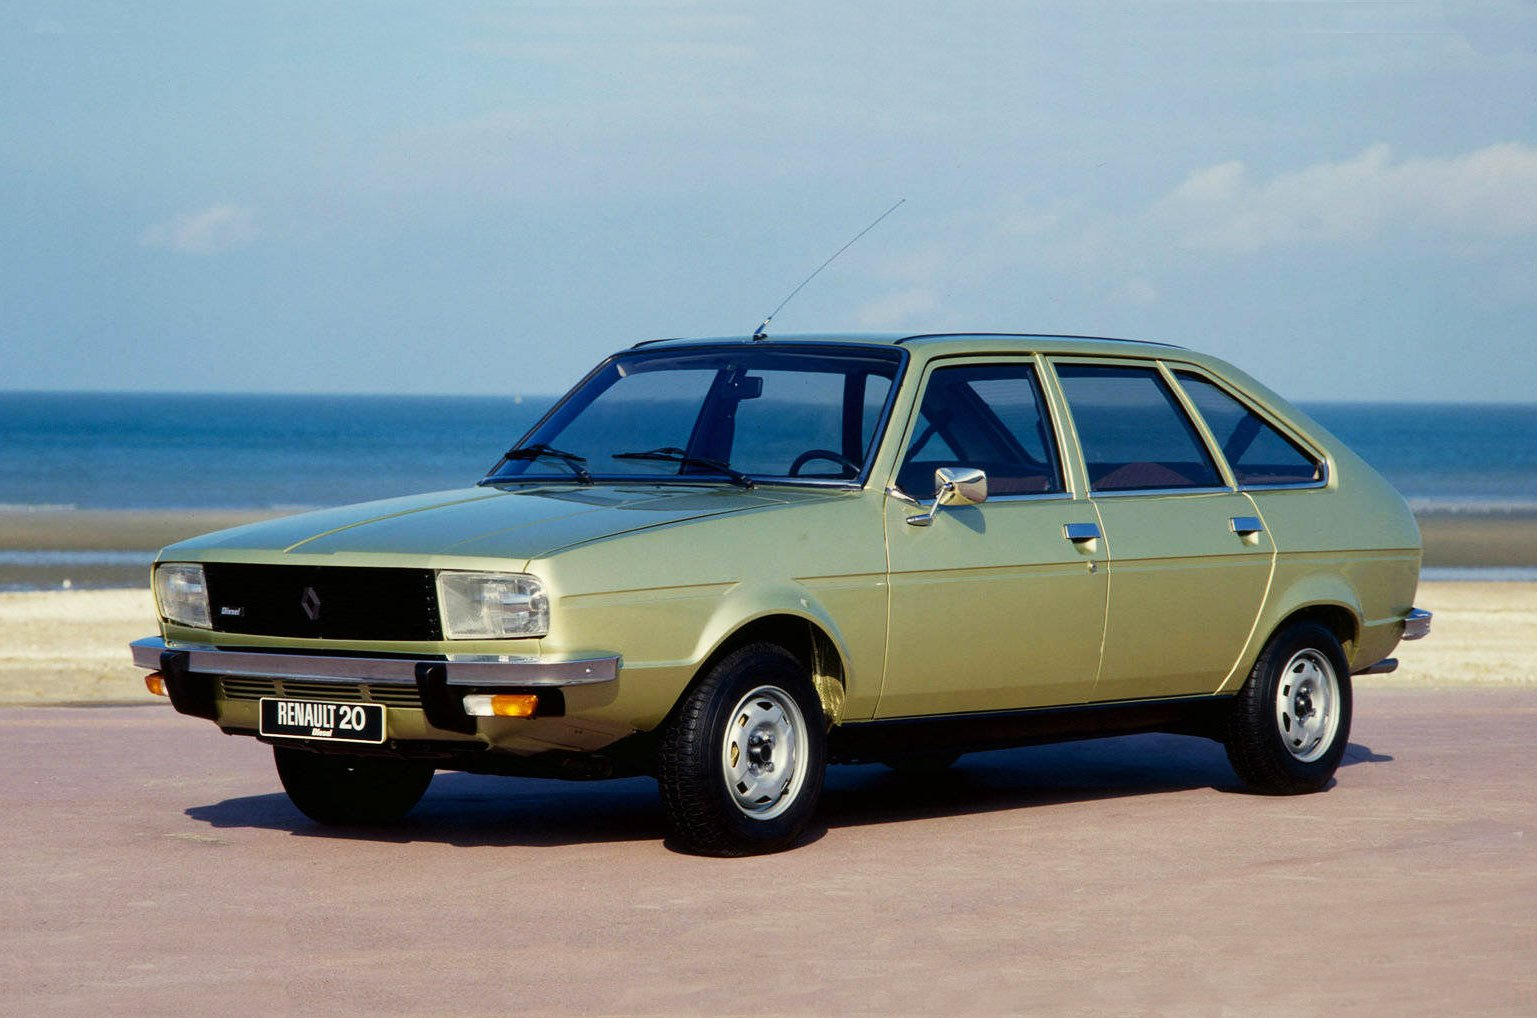 Renault 20 front